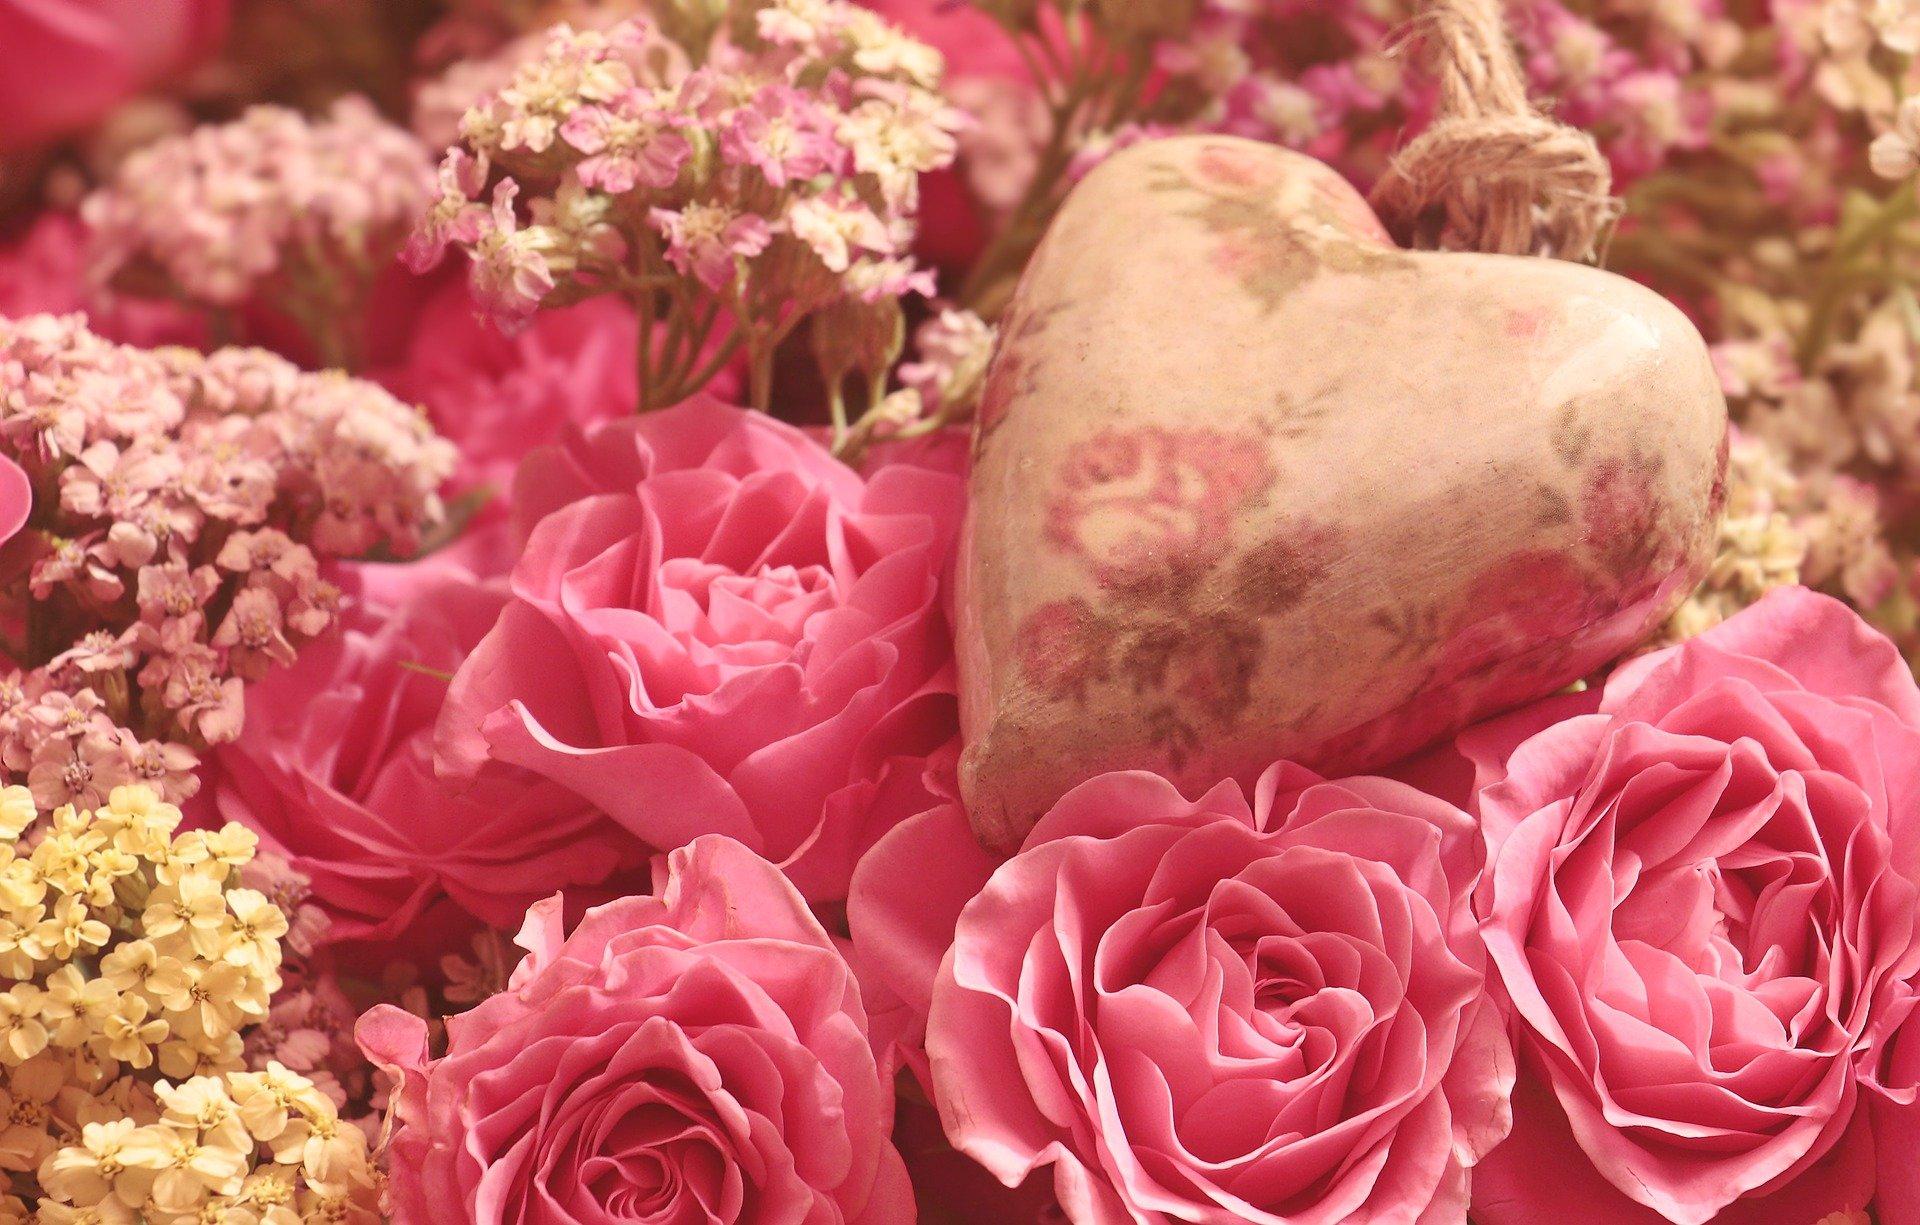 roses-3700007_1920